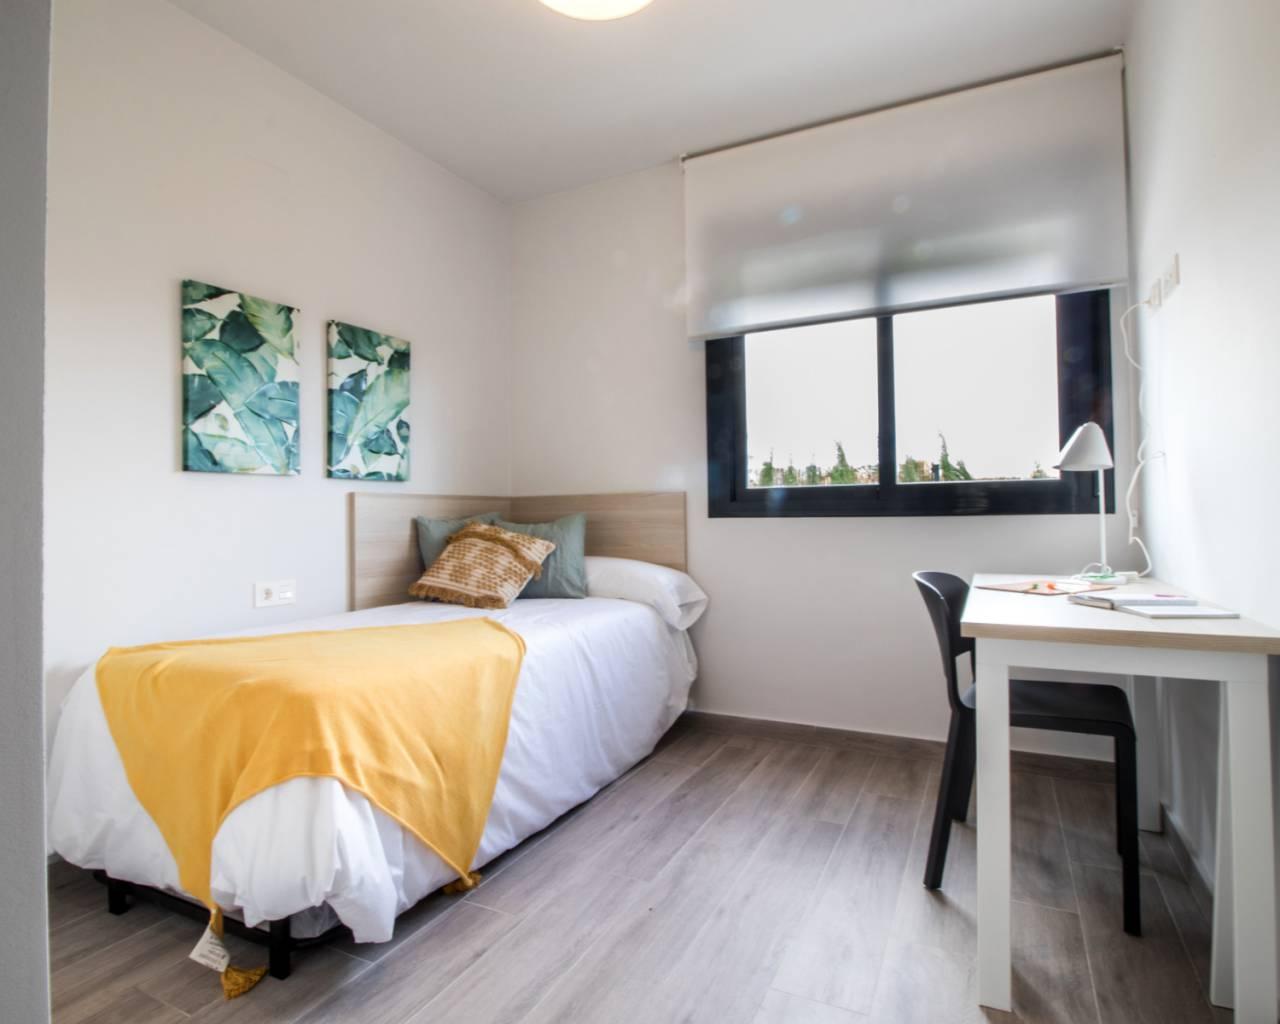 nieuwbouw-appartement-san-miguel-de-salinas_1793_xl